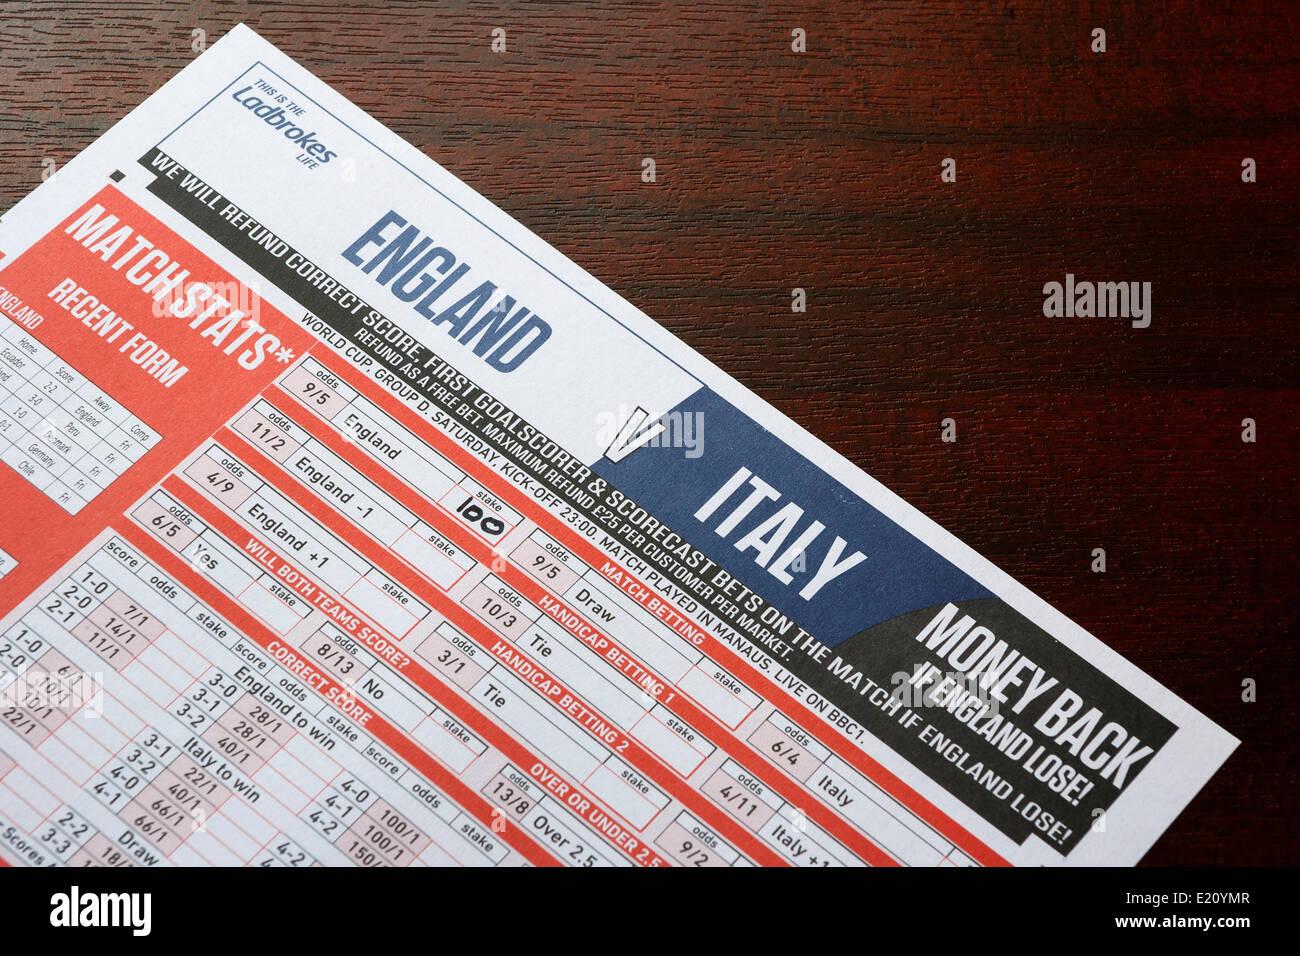 Ladbrokes grand national betting slip portugal sports betting